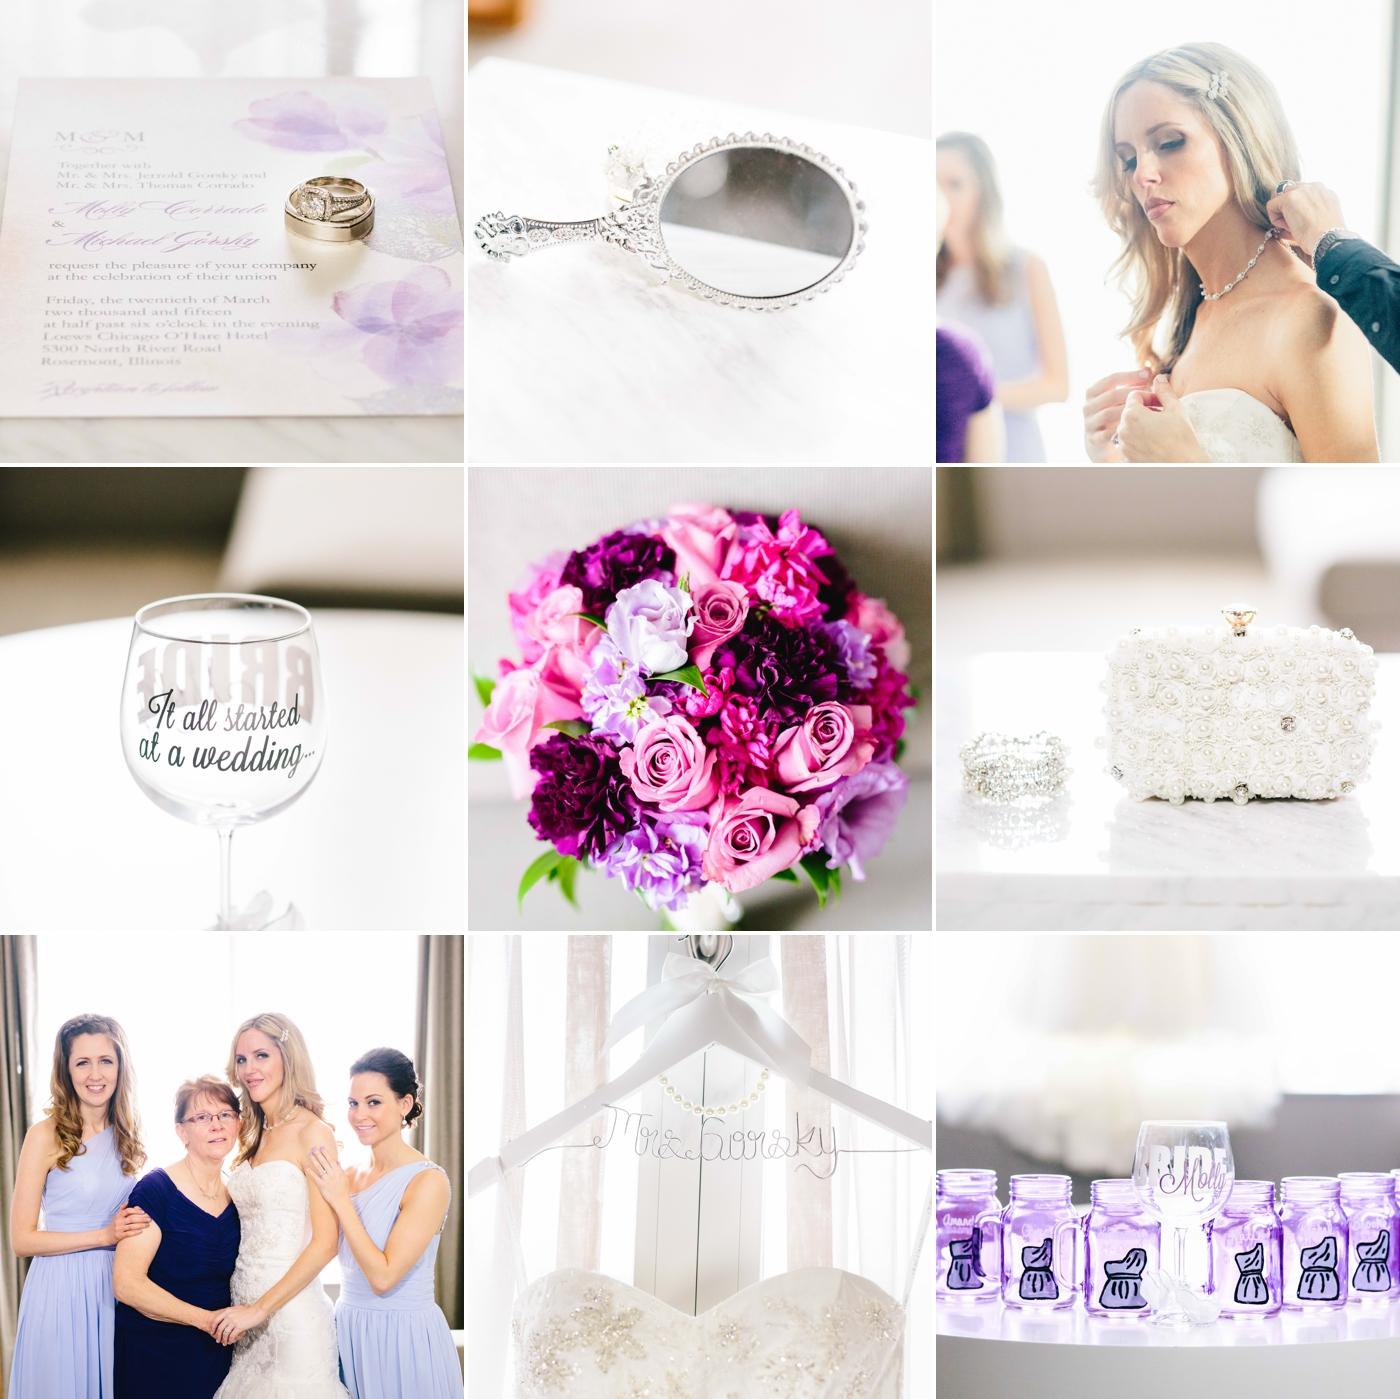 chicago-fine-art-wedding-photography-gorsky2